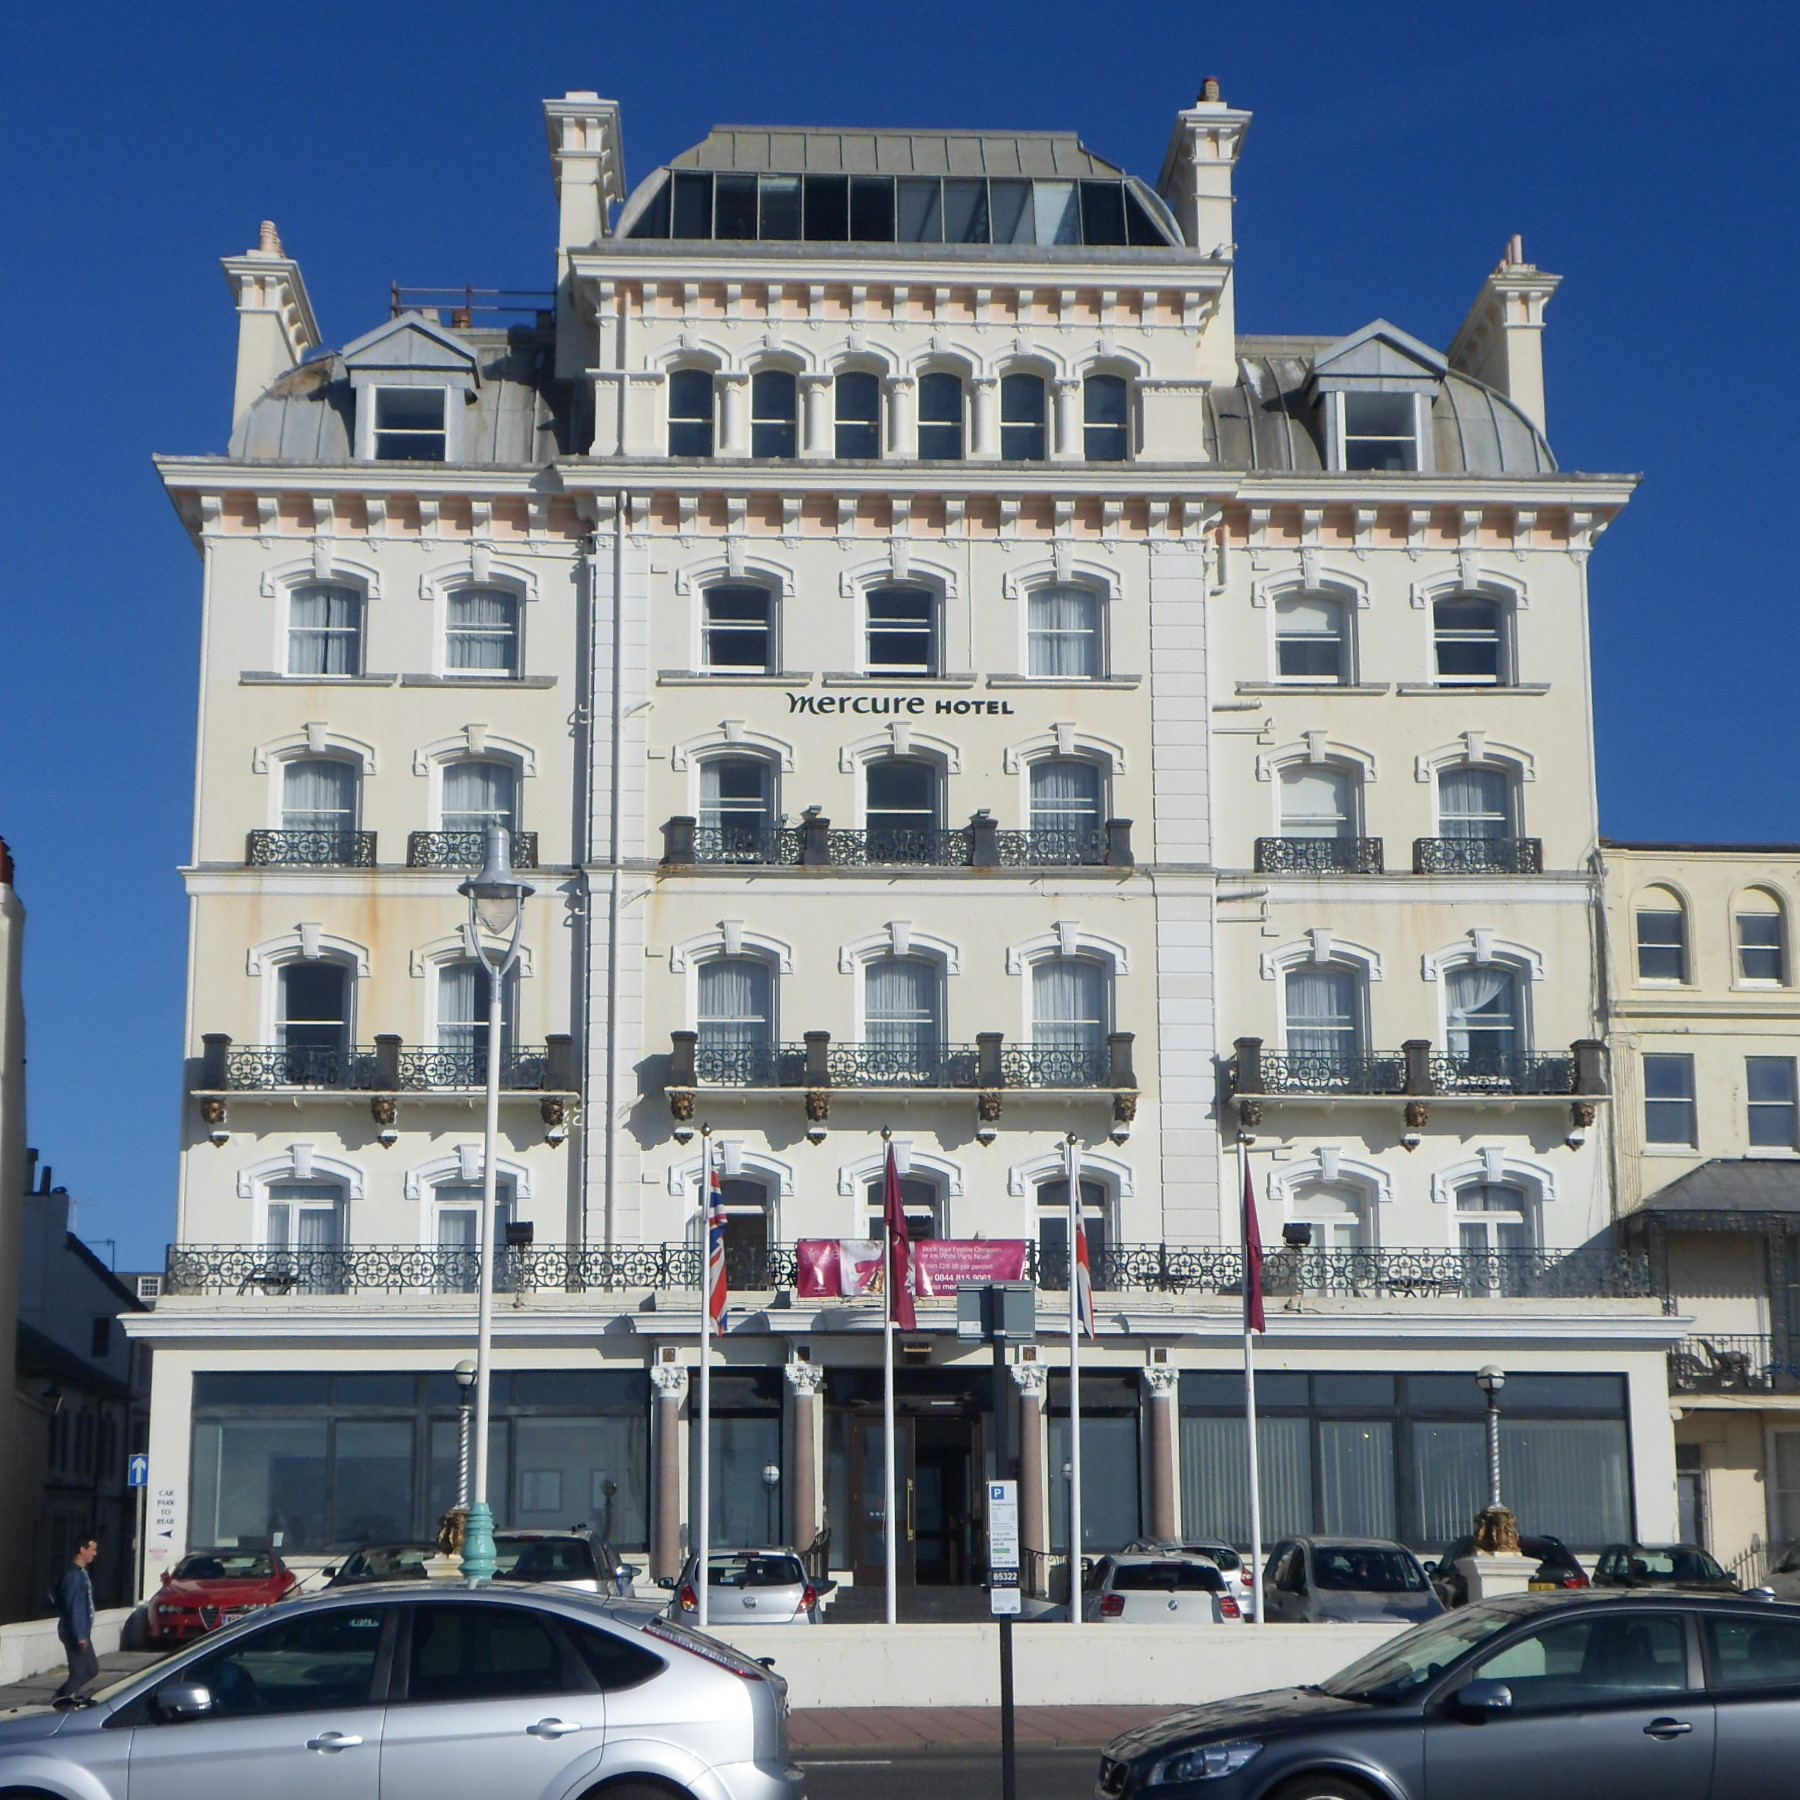 File Norfolk Hotel Mercure Brighton Seafront King 39 S Road Brighton Nhle Code 1381642